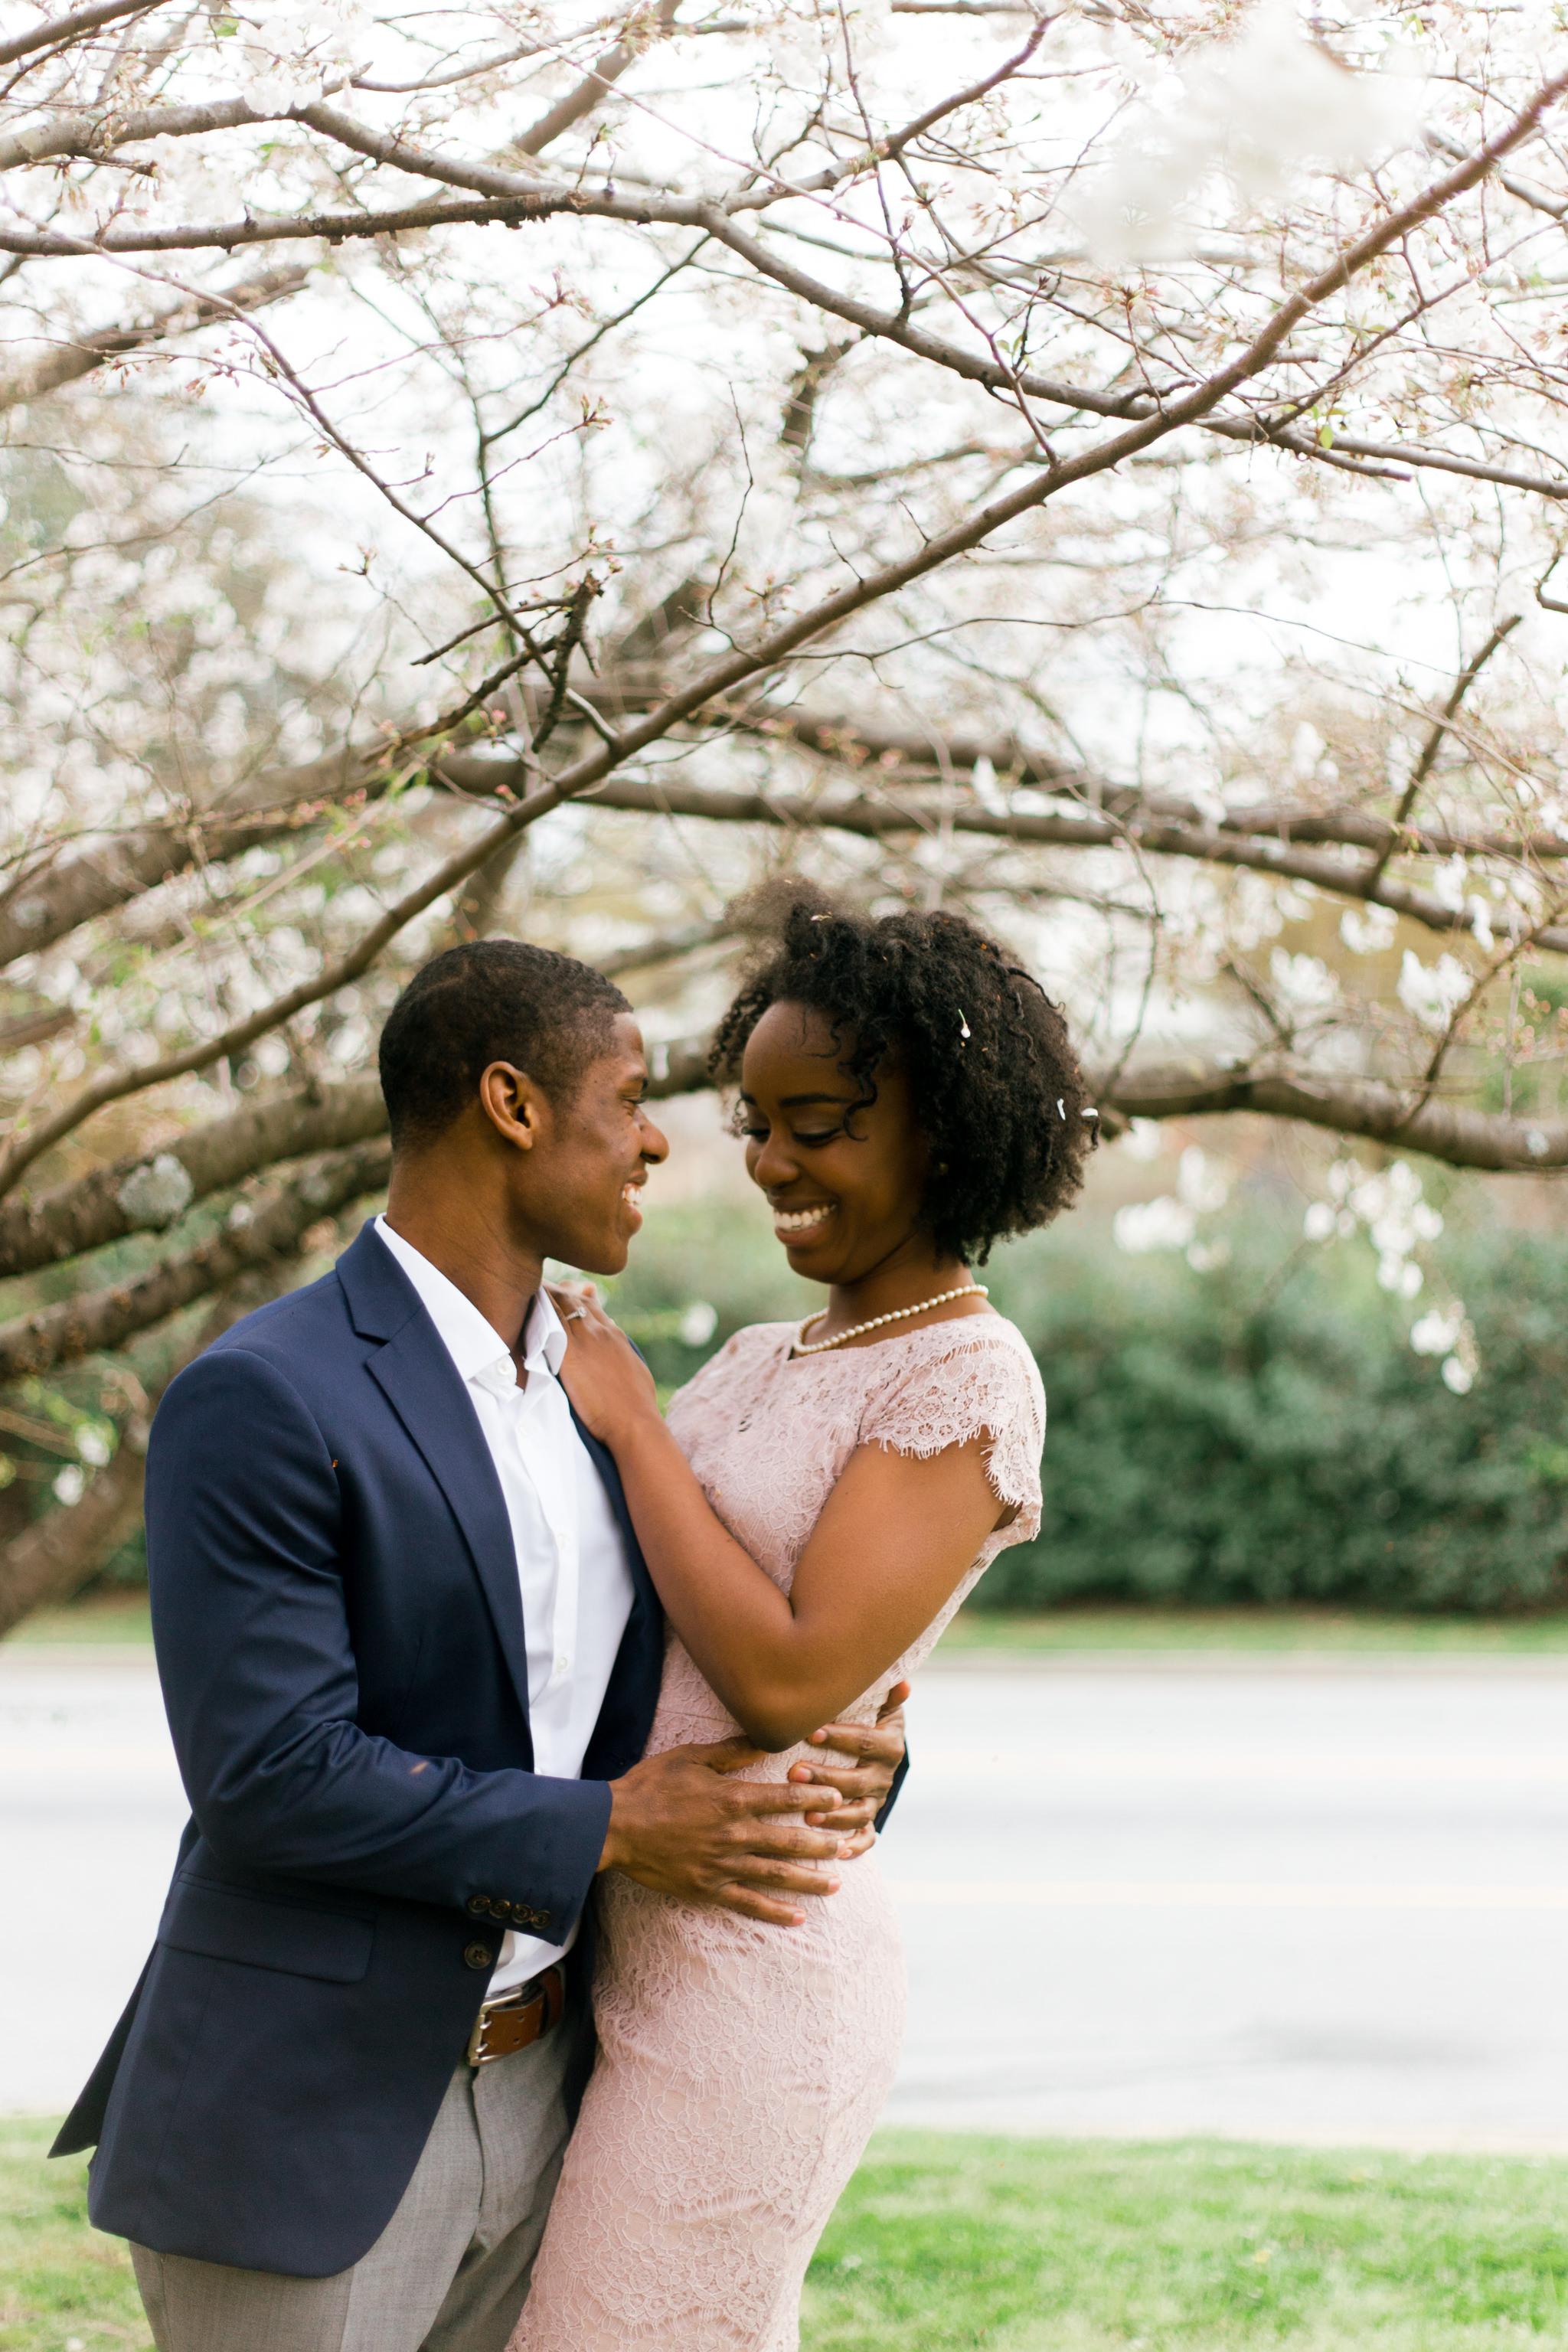 Grant-Park-Atlanta-Engagement-Pictures-Kiyah-C-Photography-16.jpg